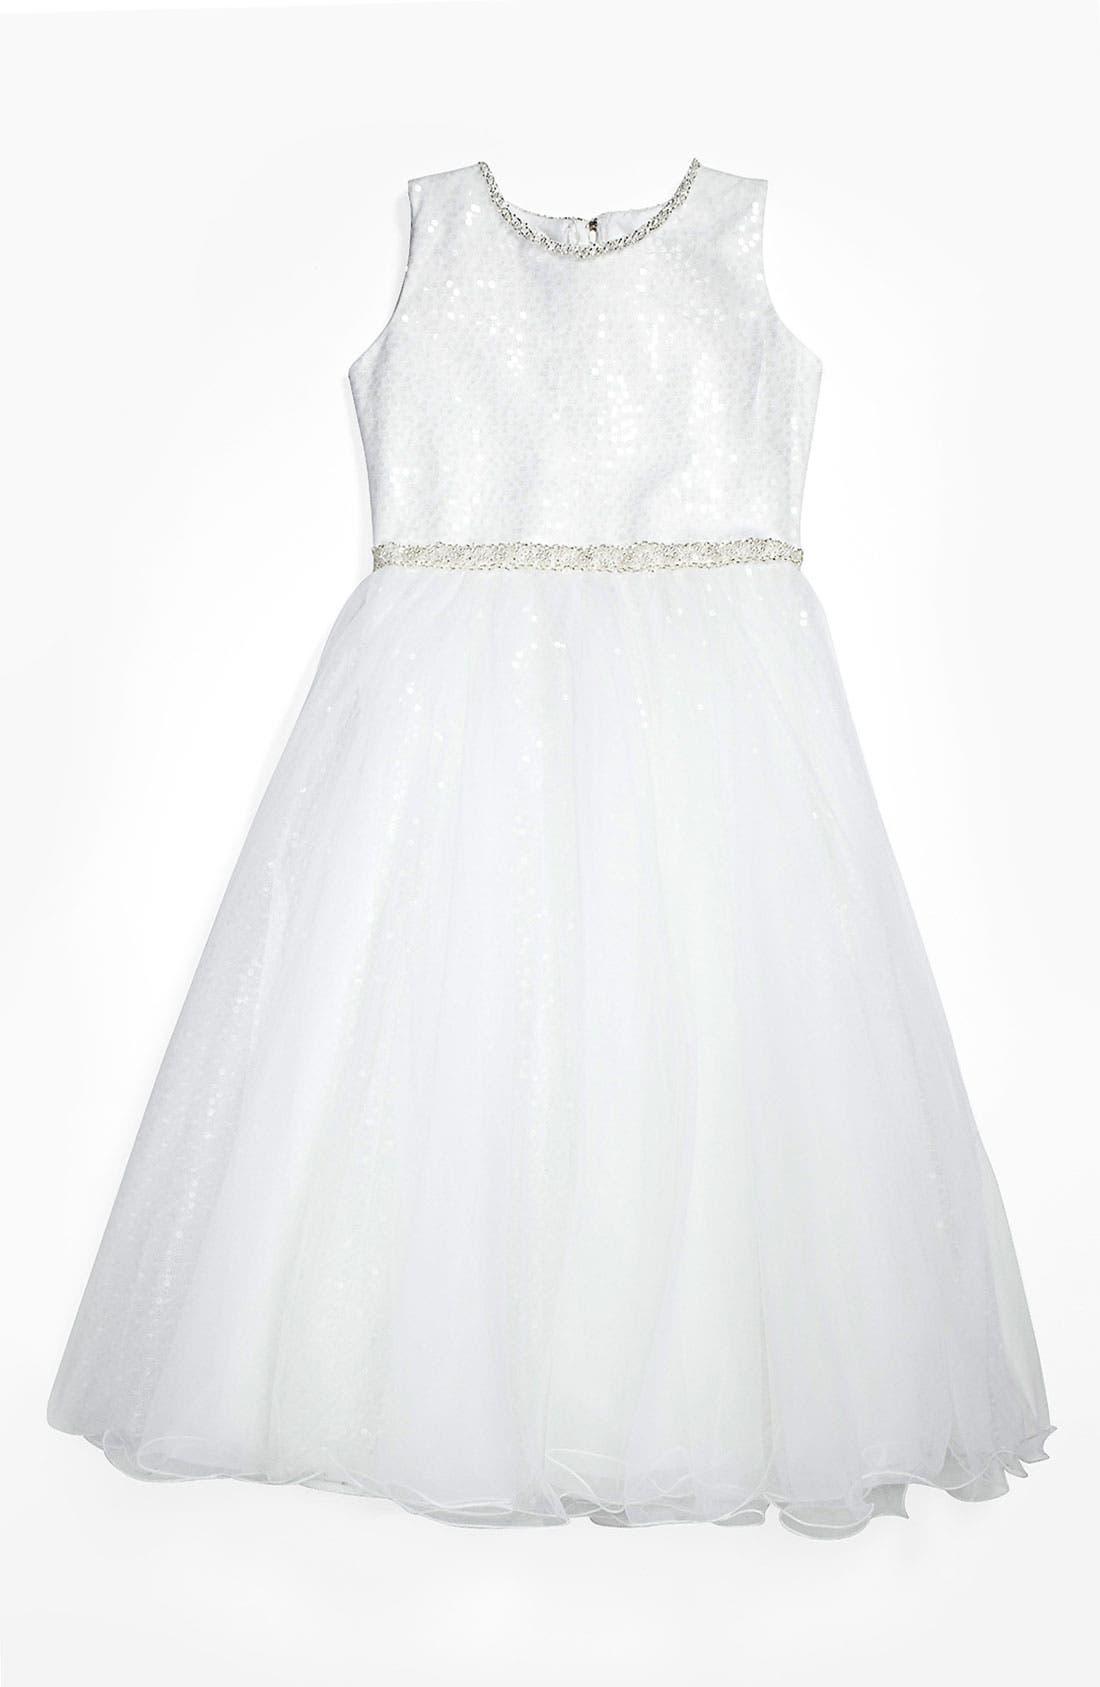 Alternate Image 1 Selected - Joan Calabrese for Mon Cheri Tulle Dress (Big Girls)